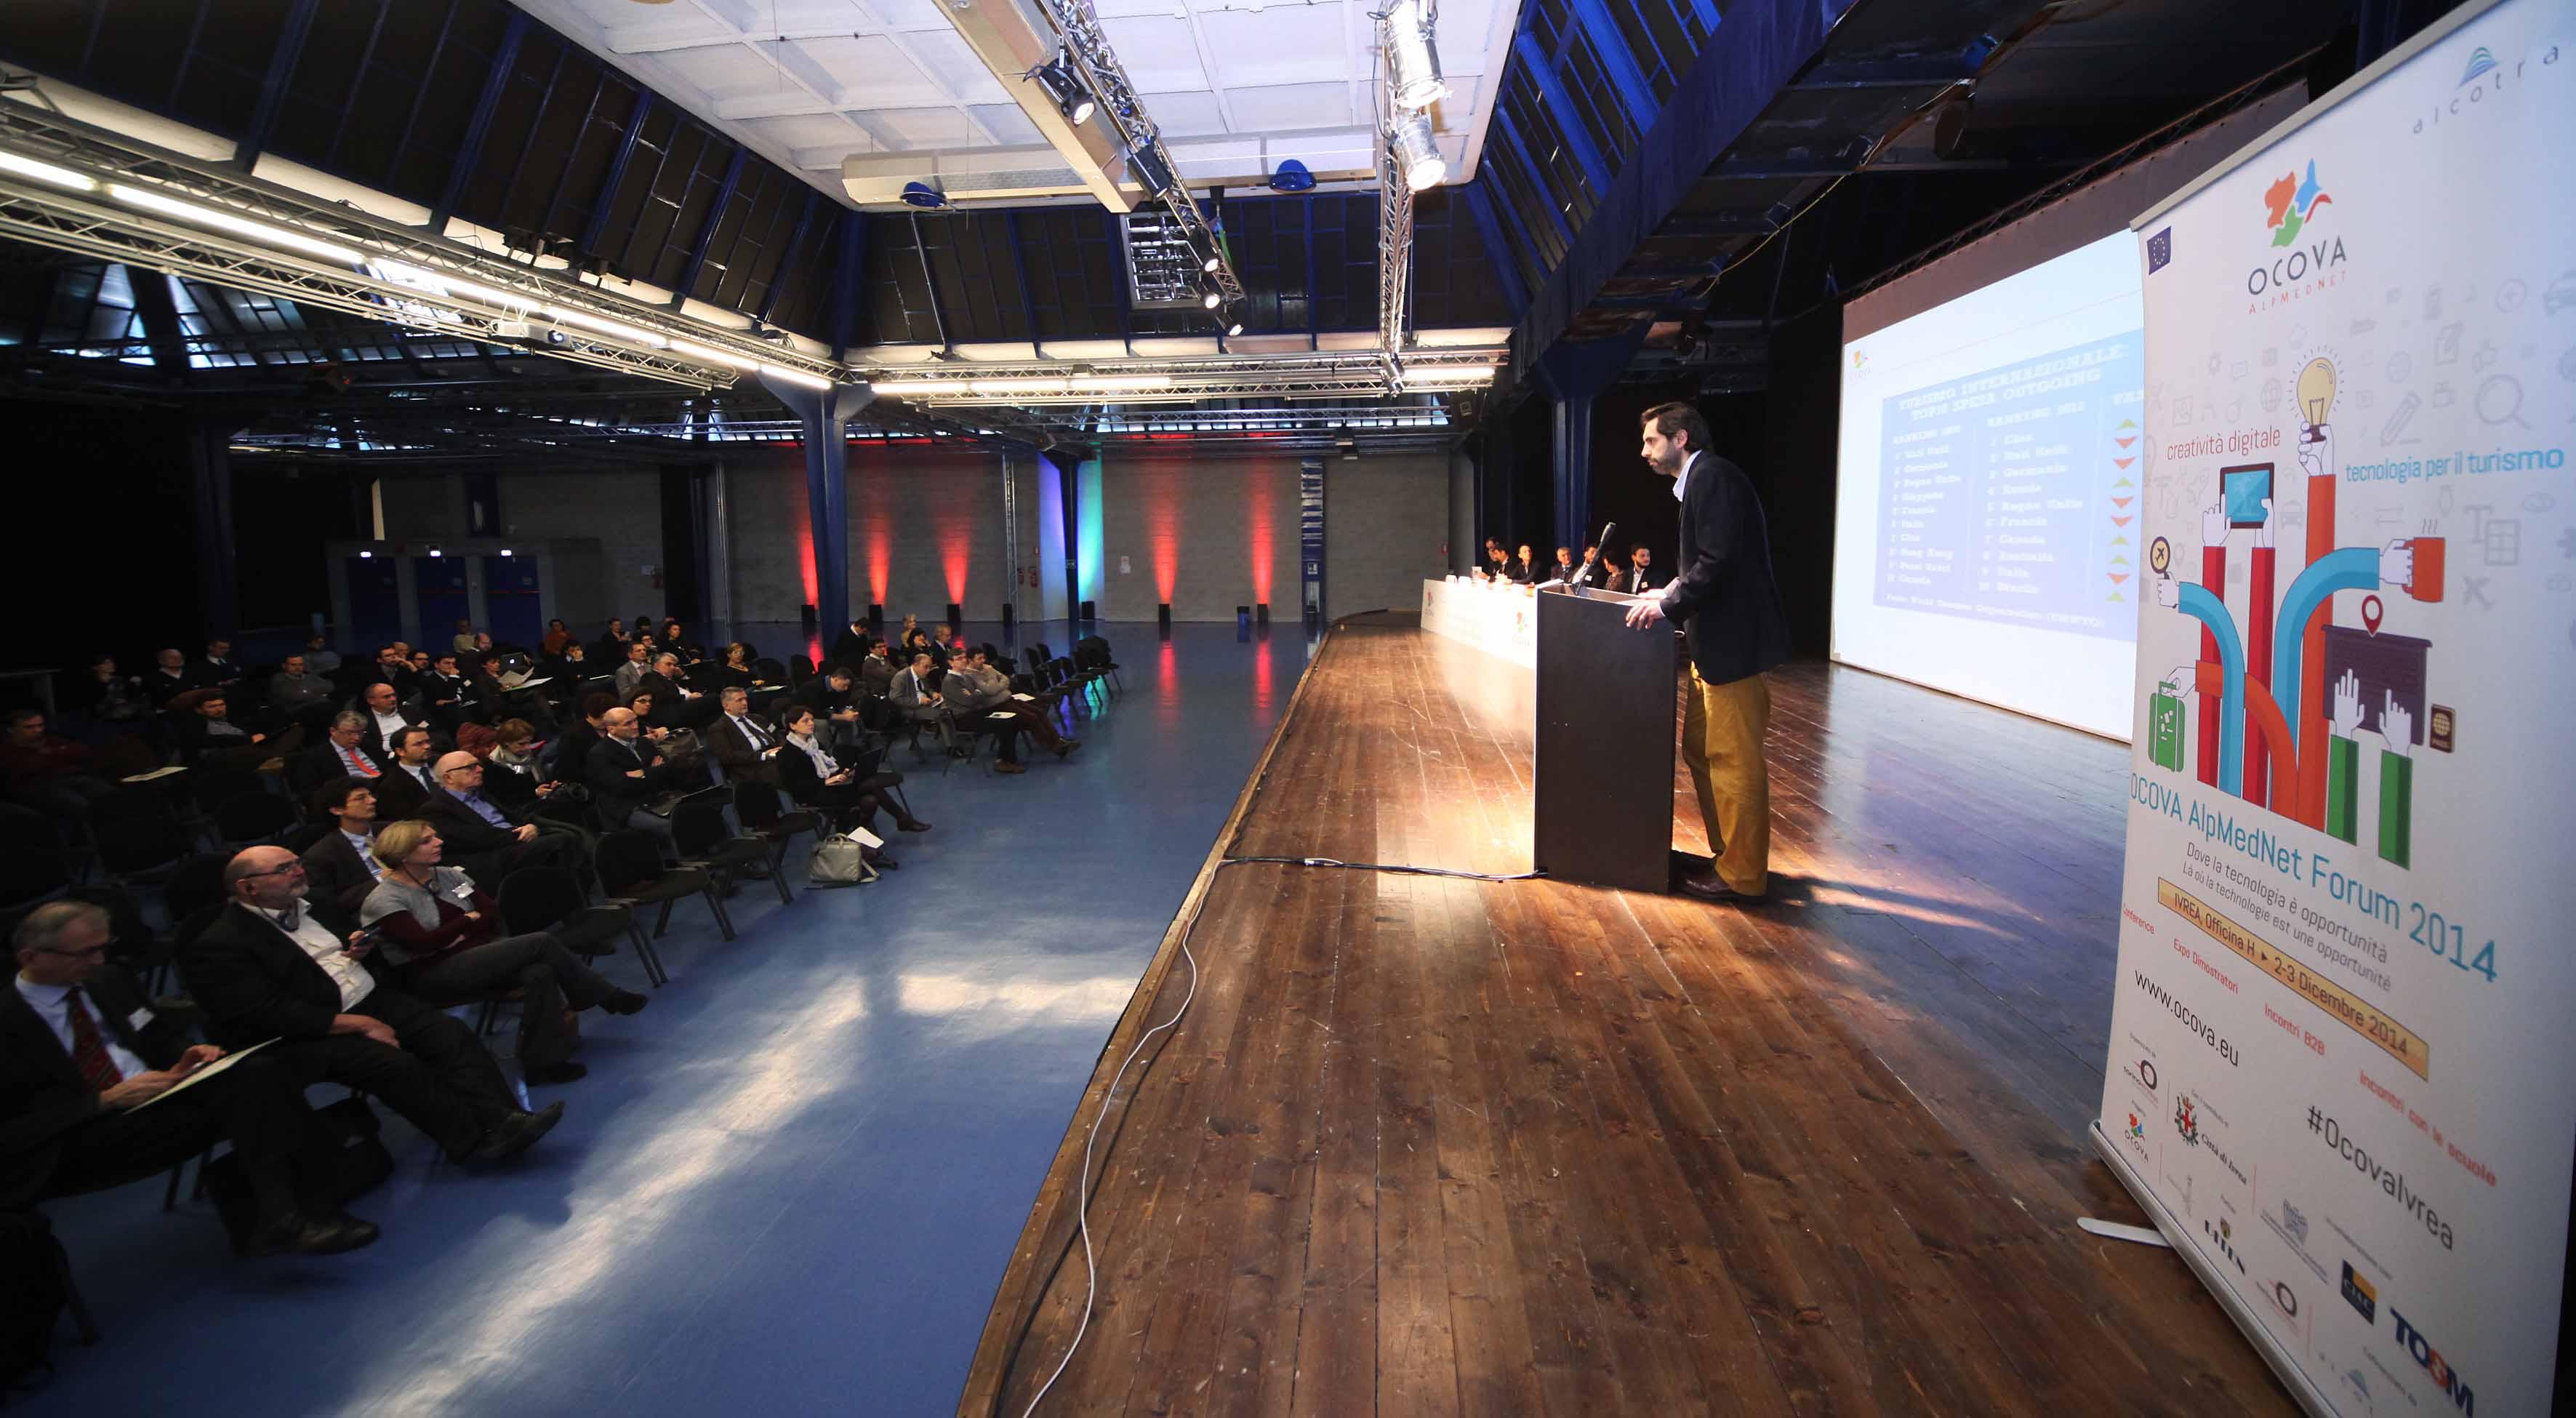 Ivrea 2014 – Conference